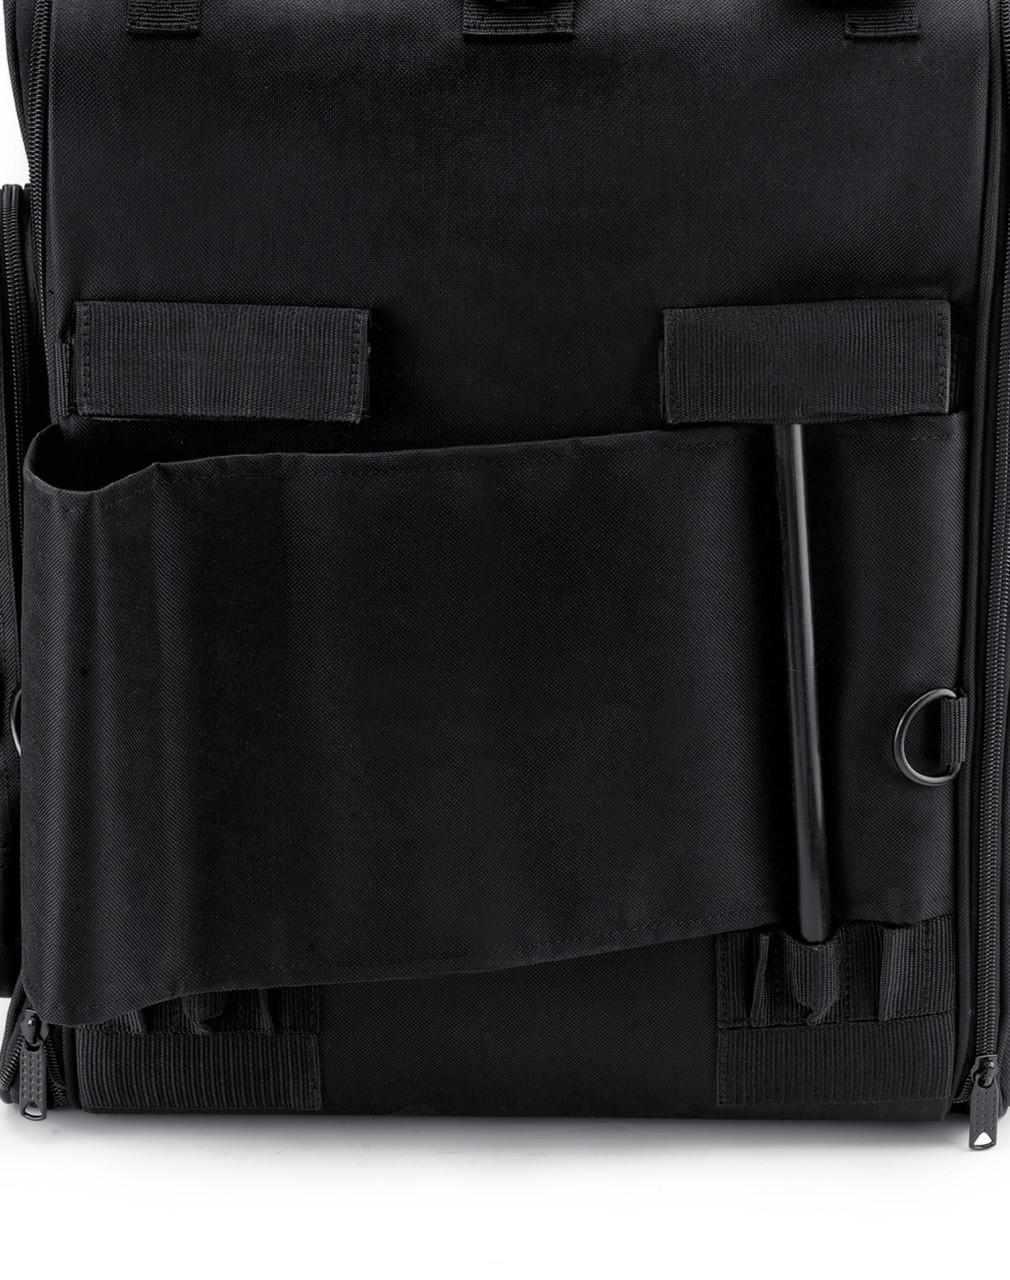 Suzuki Viking Extra Large Plain Motorcycle Sissy Bar Bag Back Side View